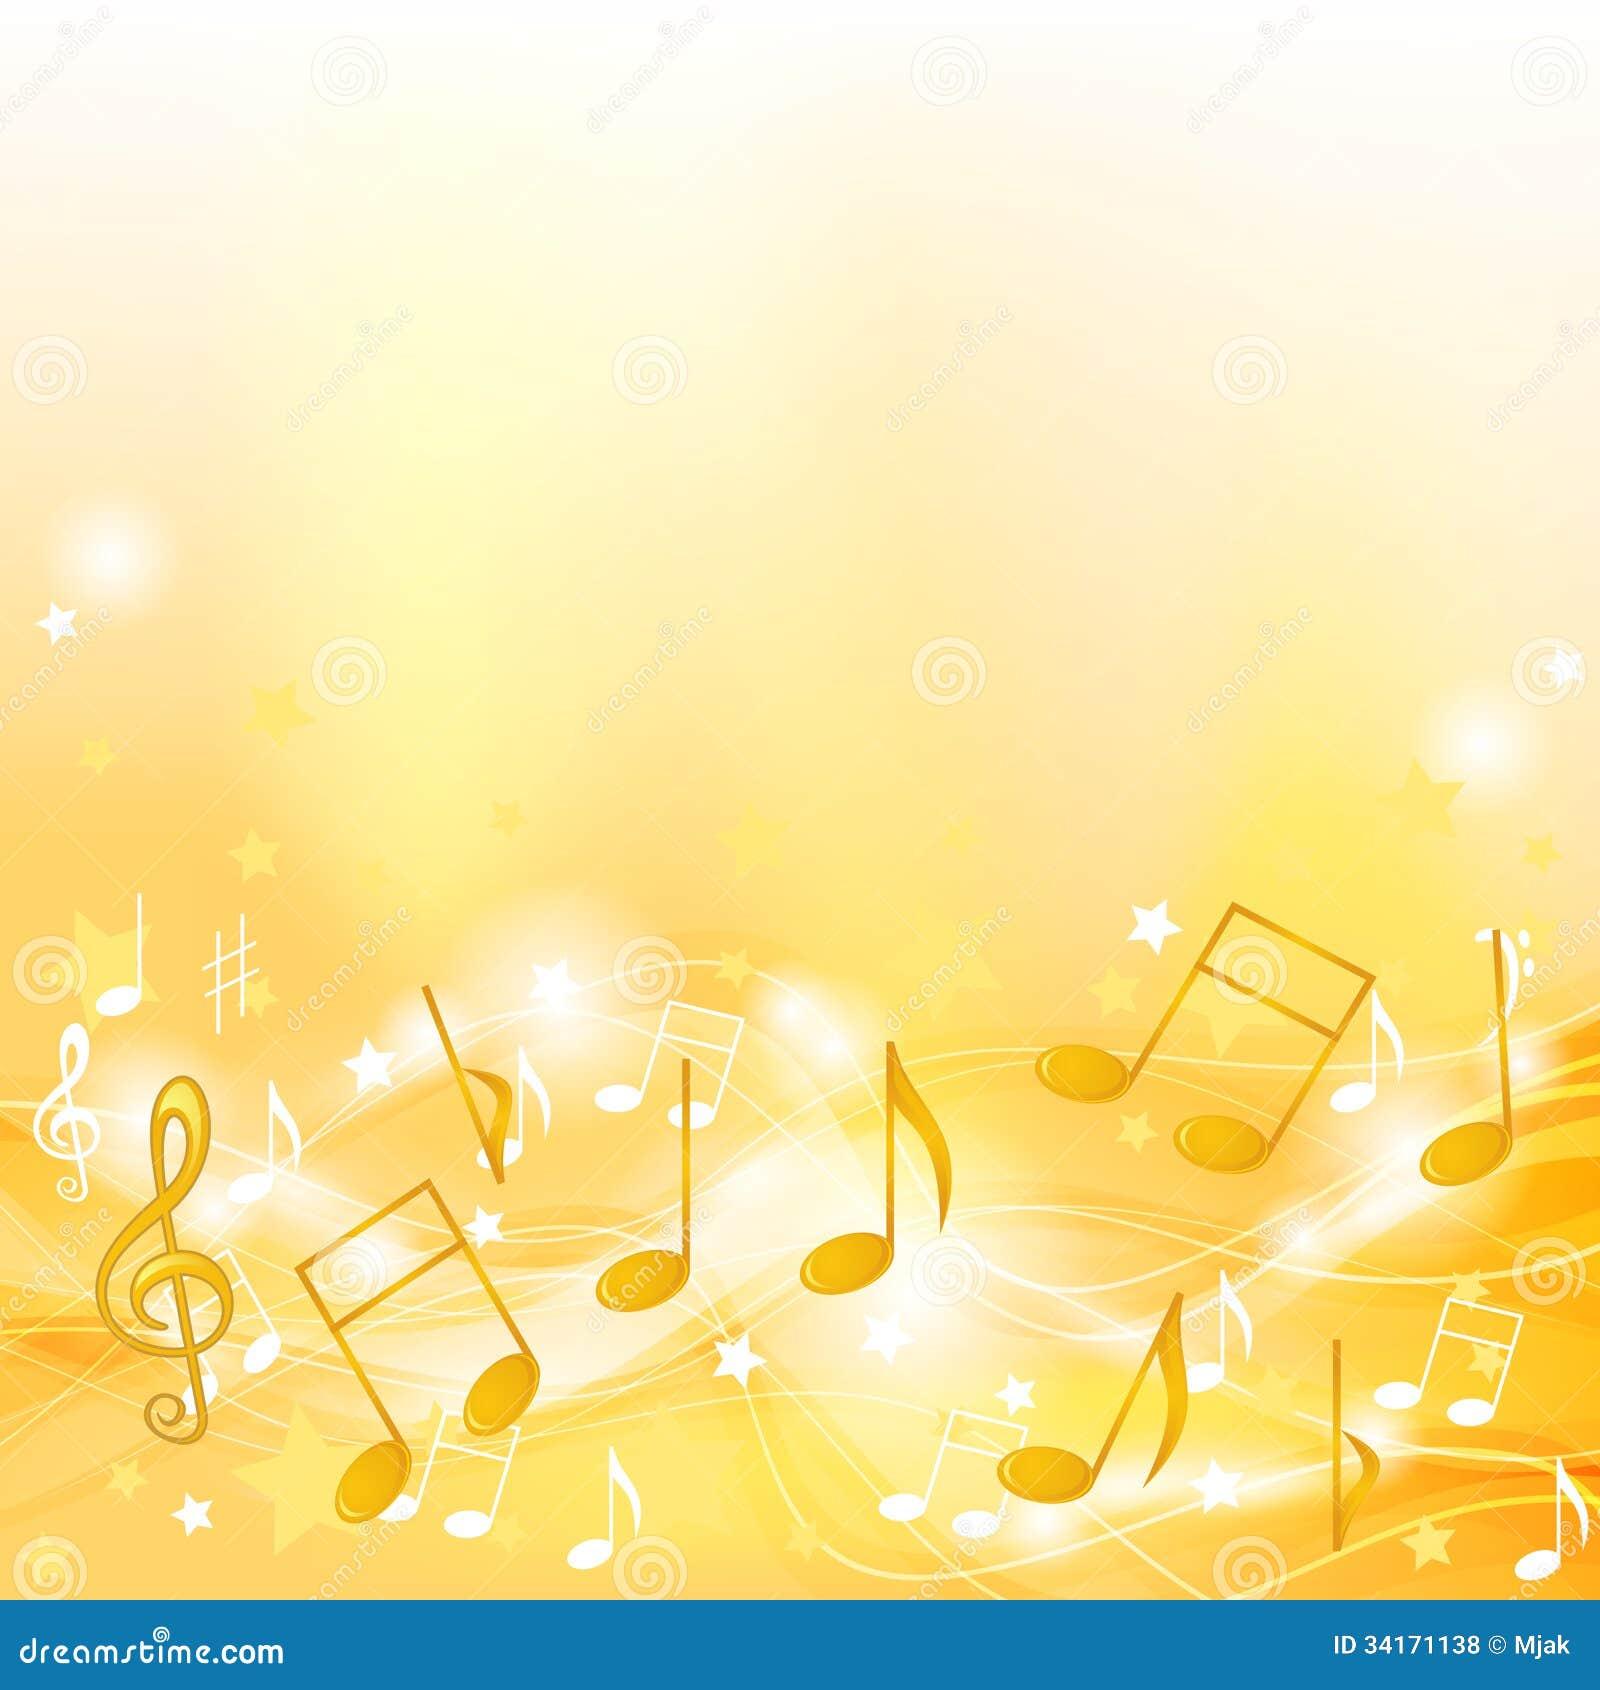 Golden Melody Royalty Free Stock Photos - Image: 34171138